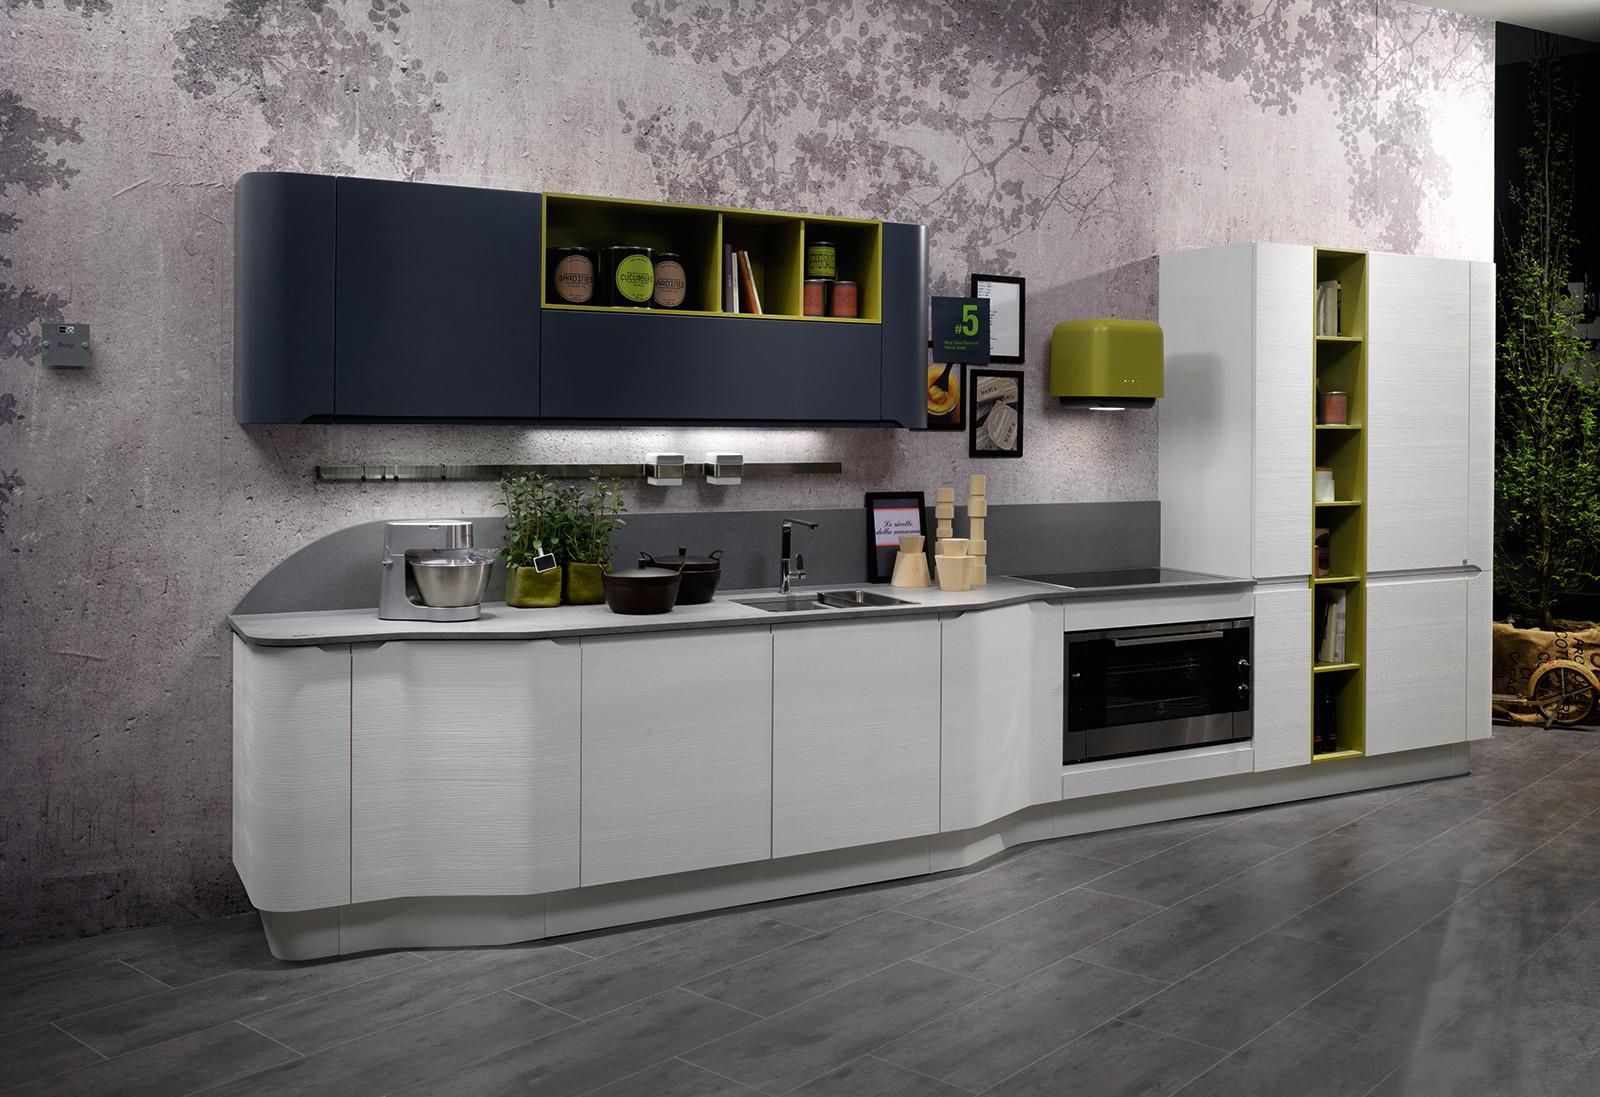 Cucine moderne torino tradizionali e di design for Cucine moderne design